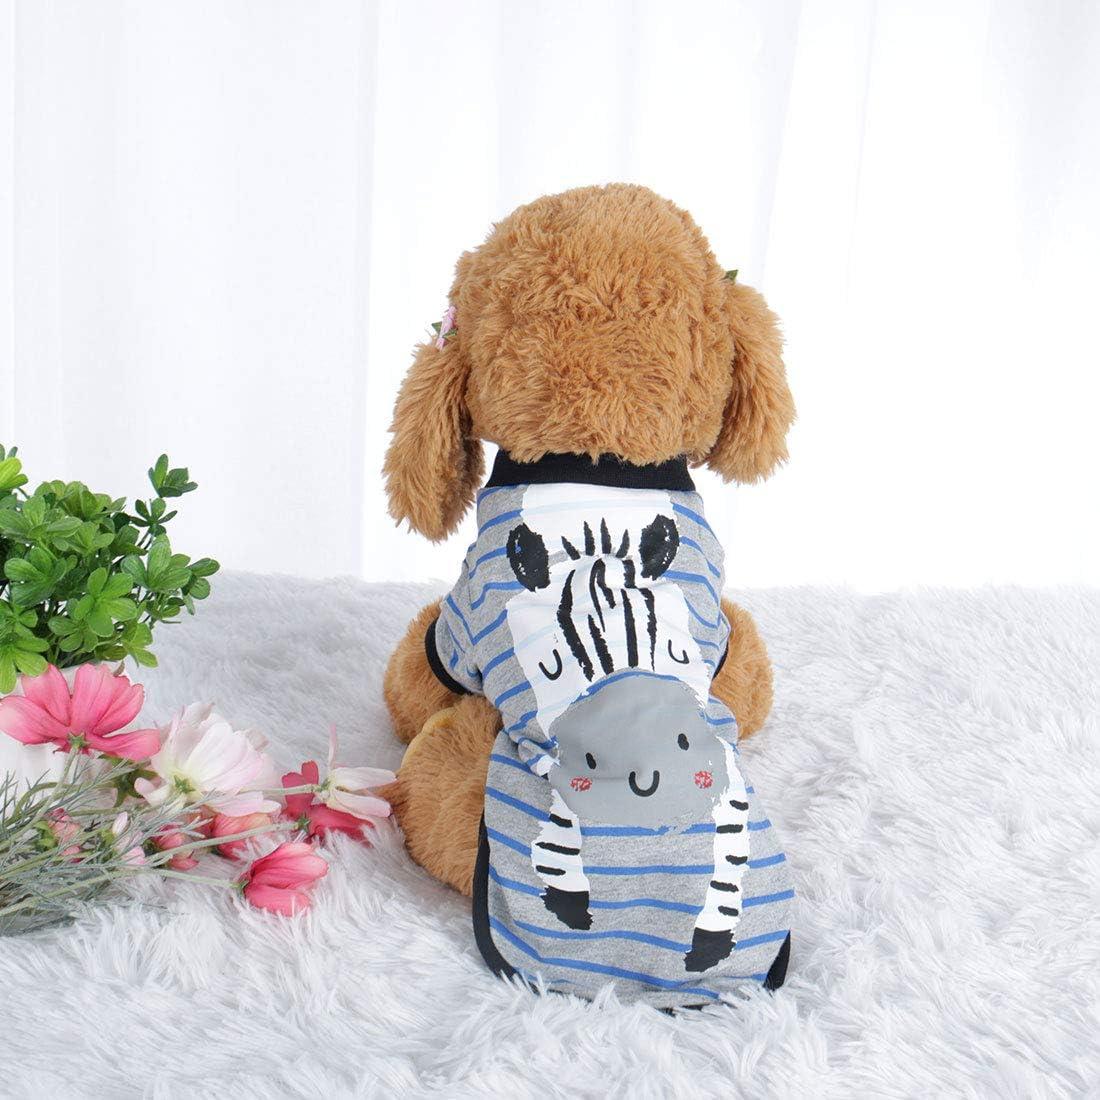 Welpen Oberteil Kost/üm Katze Weste Sourcing Map Hunde-T-Shirt Haustier Sweatshirt Kleidung Fr/ühling//Herbst Baumwolle